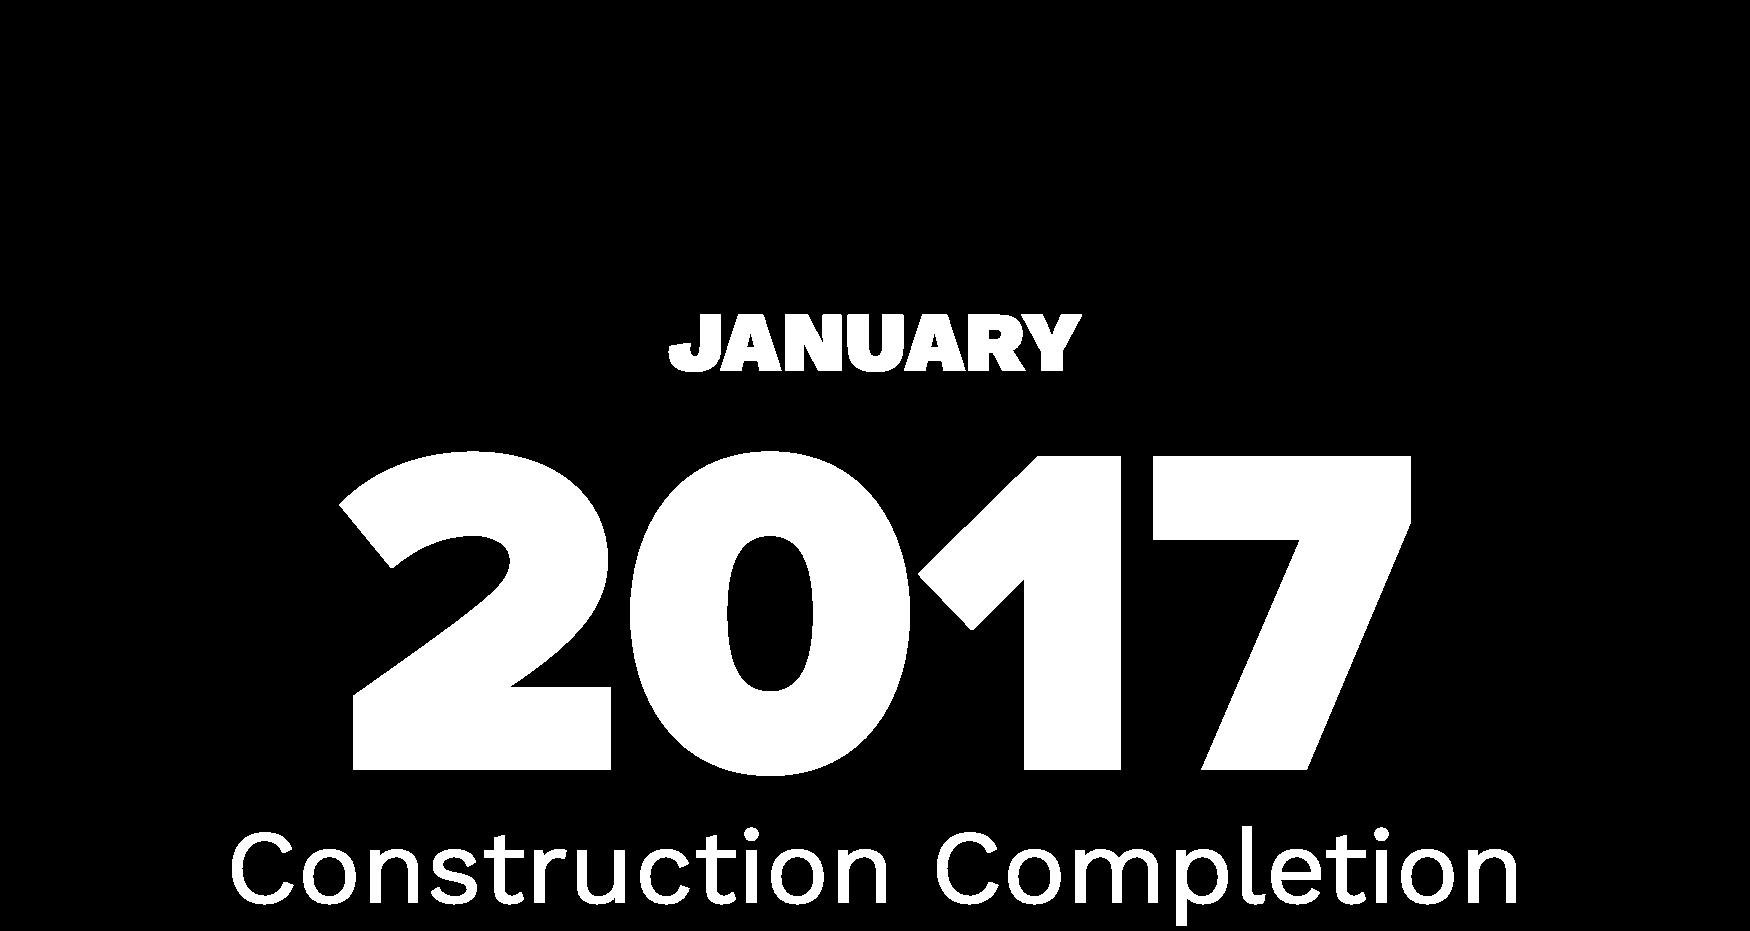 TheHub_2017Construction